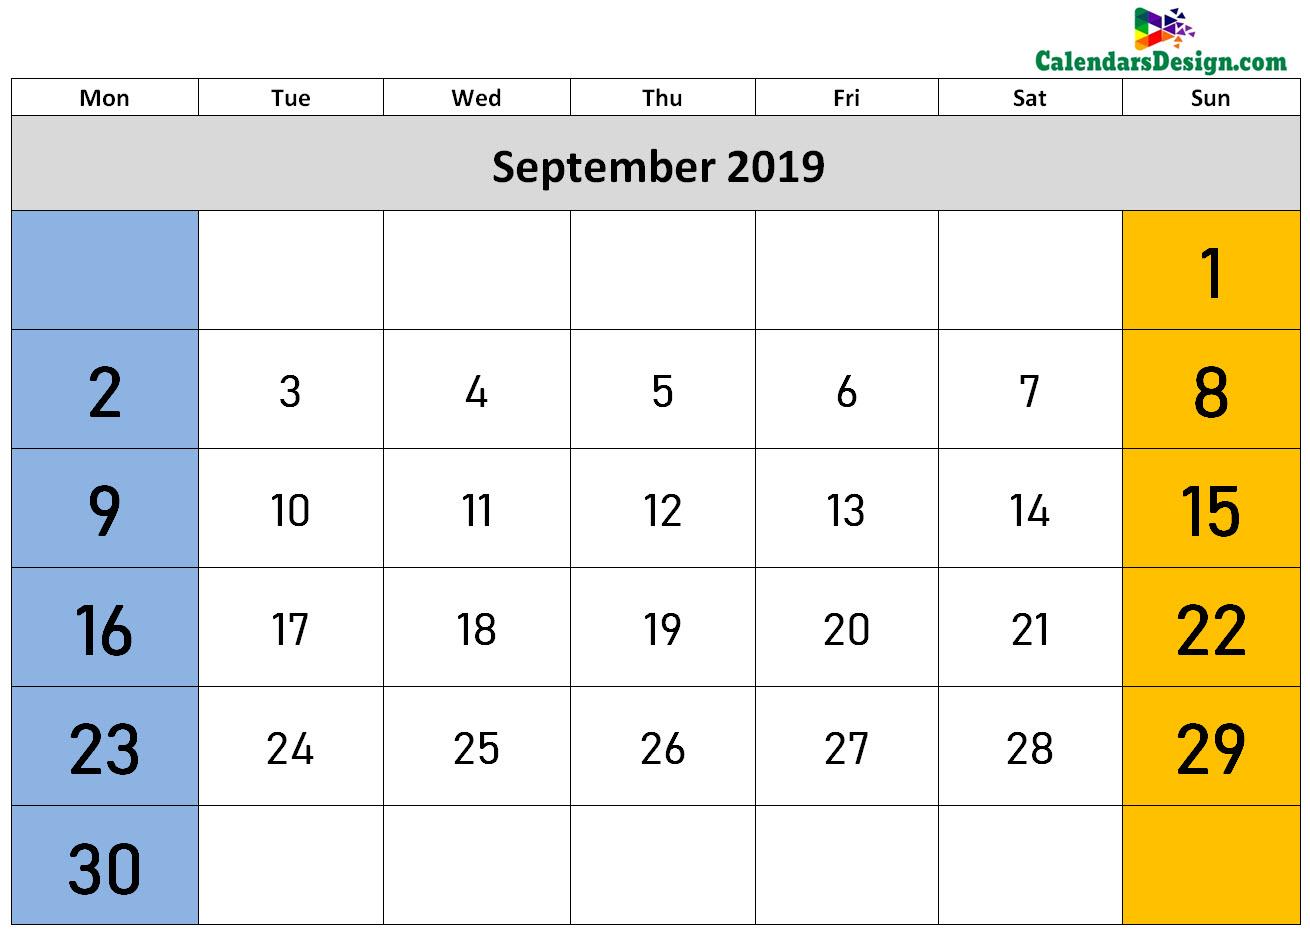 2019 September Calendar Holidays in Word